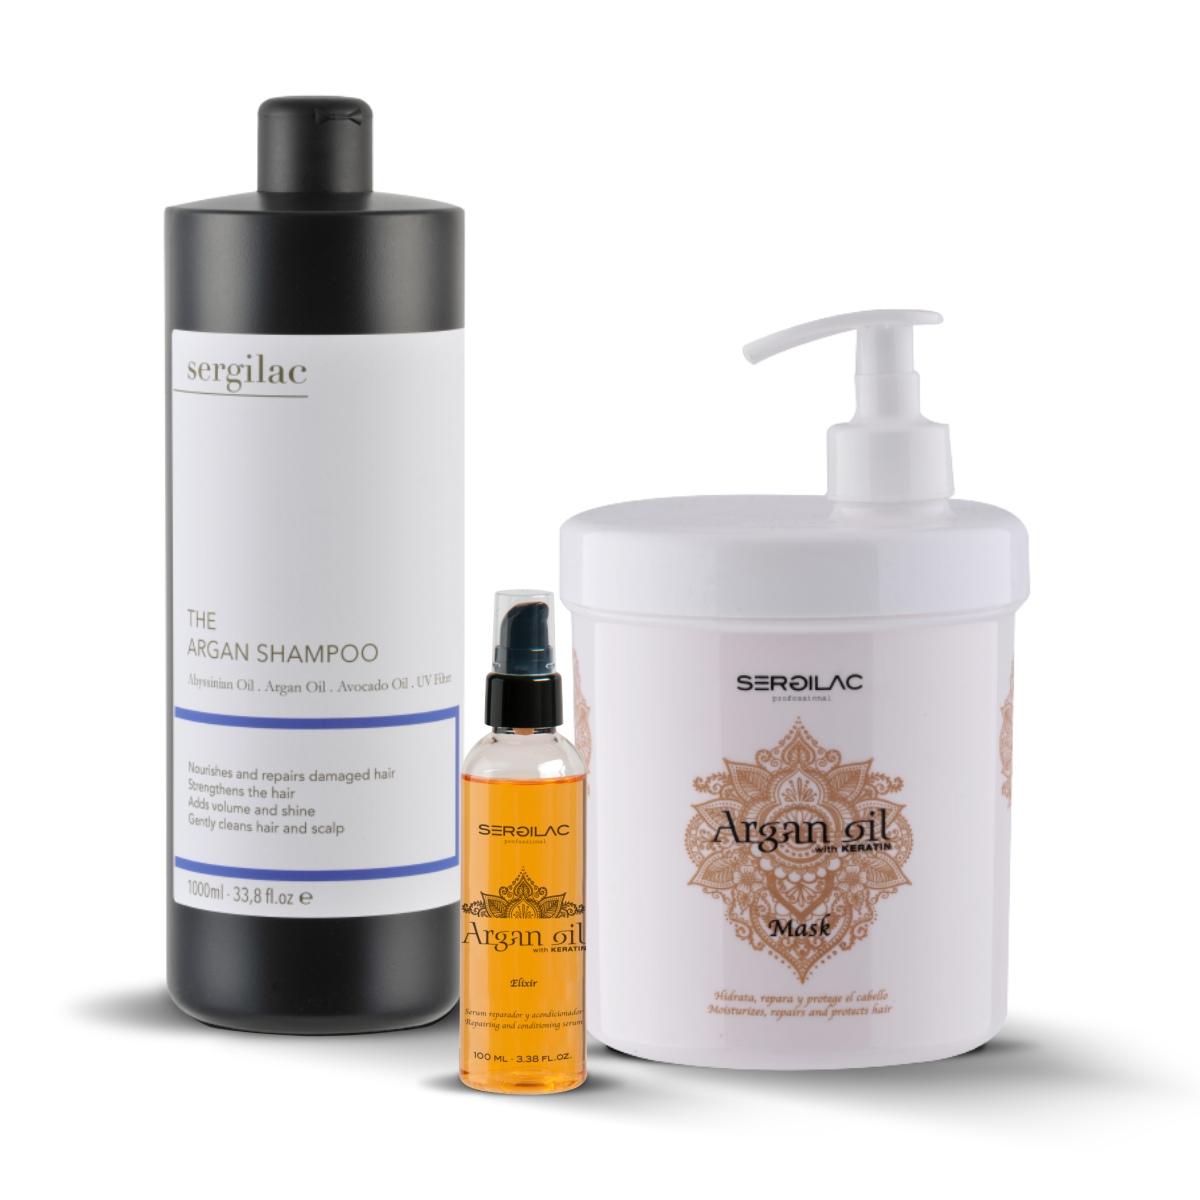 Lote Sergilac - The Argan Shampoo + Mask + Elixir